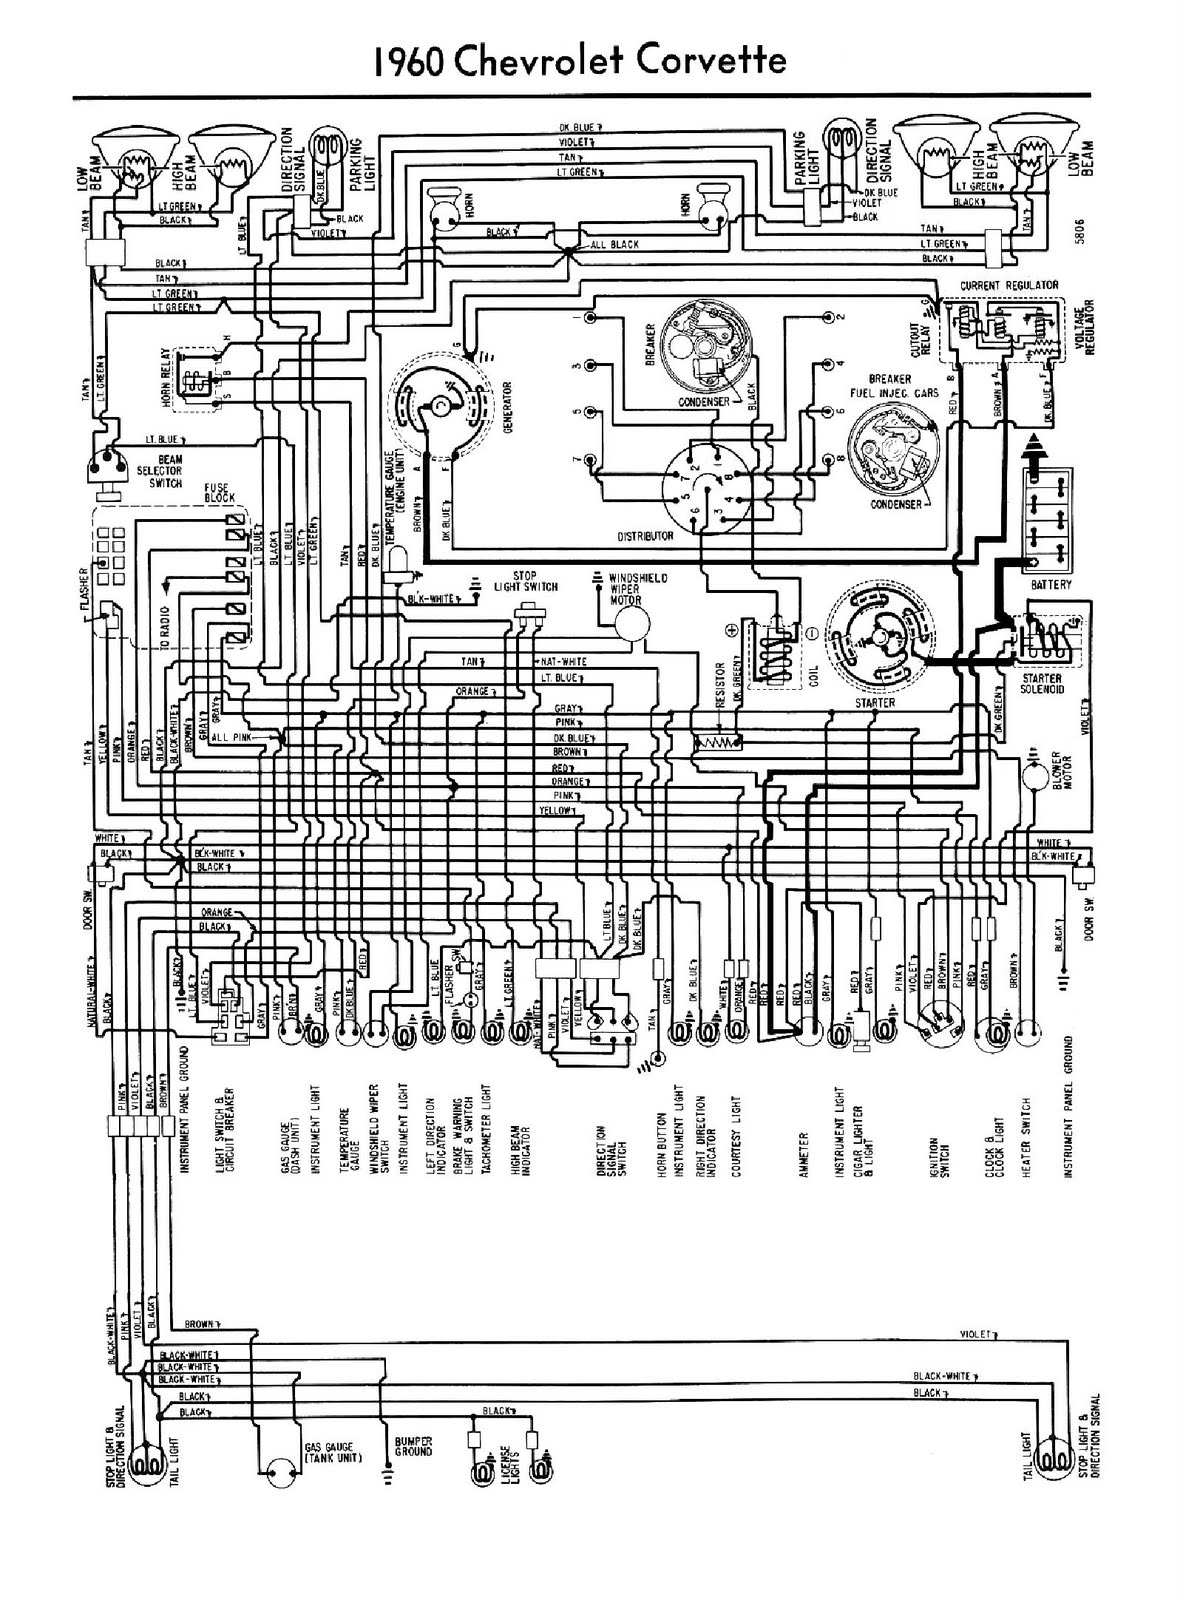 1960 corvette wiring diagram free vehicle wiring diagrams u2022 rh generalinfo co 1986 chevy truck wiring 1957  [ 1183 x 1600 Pixel ]